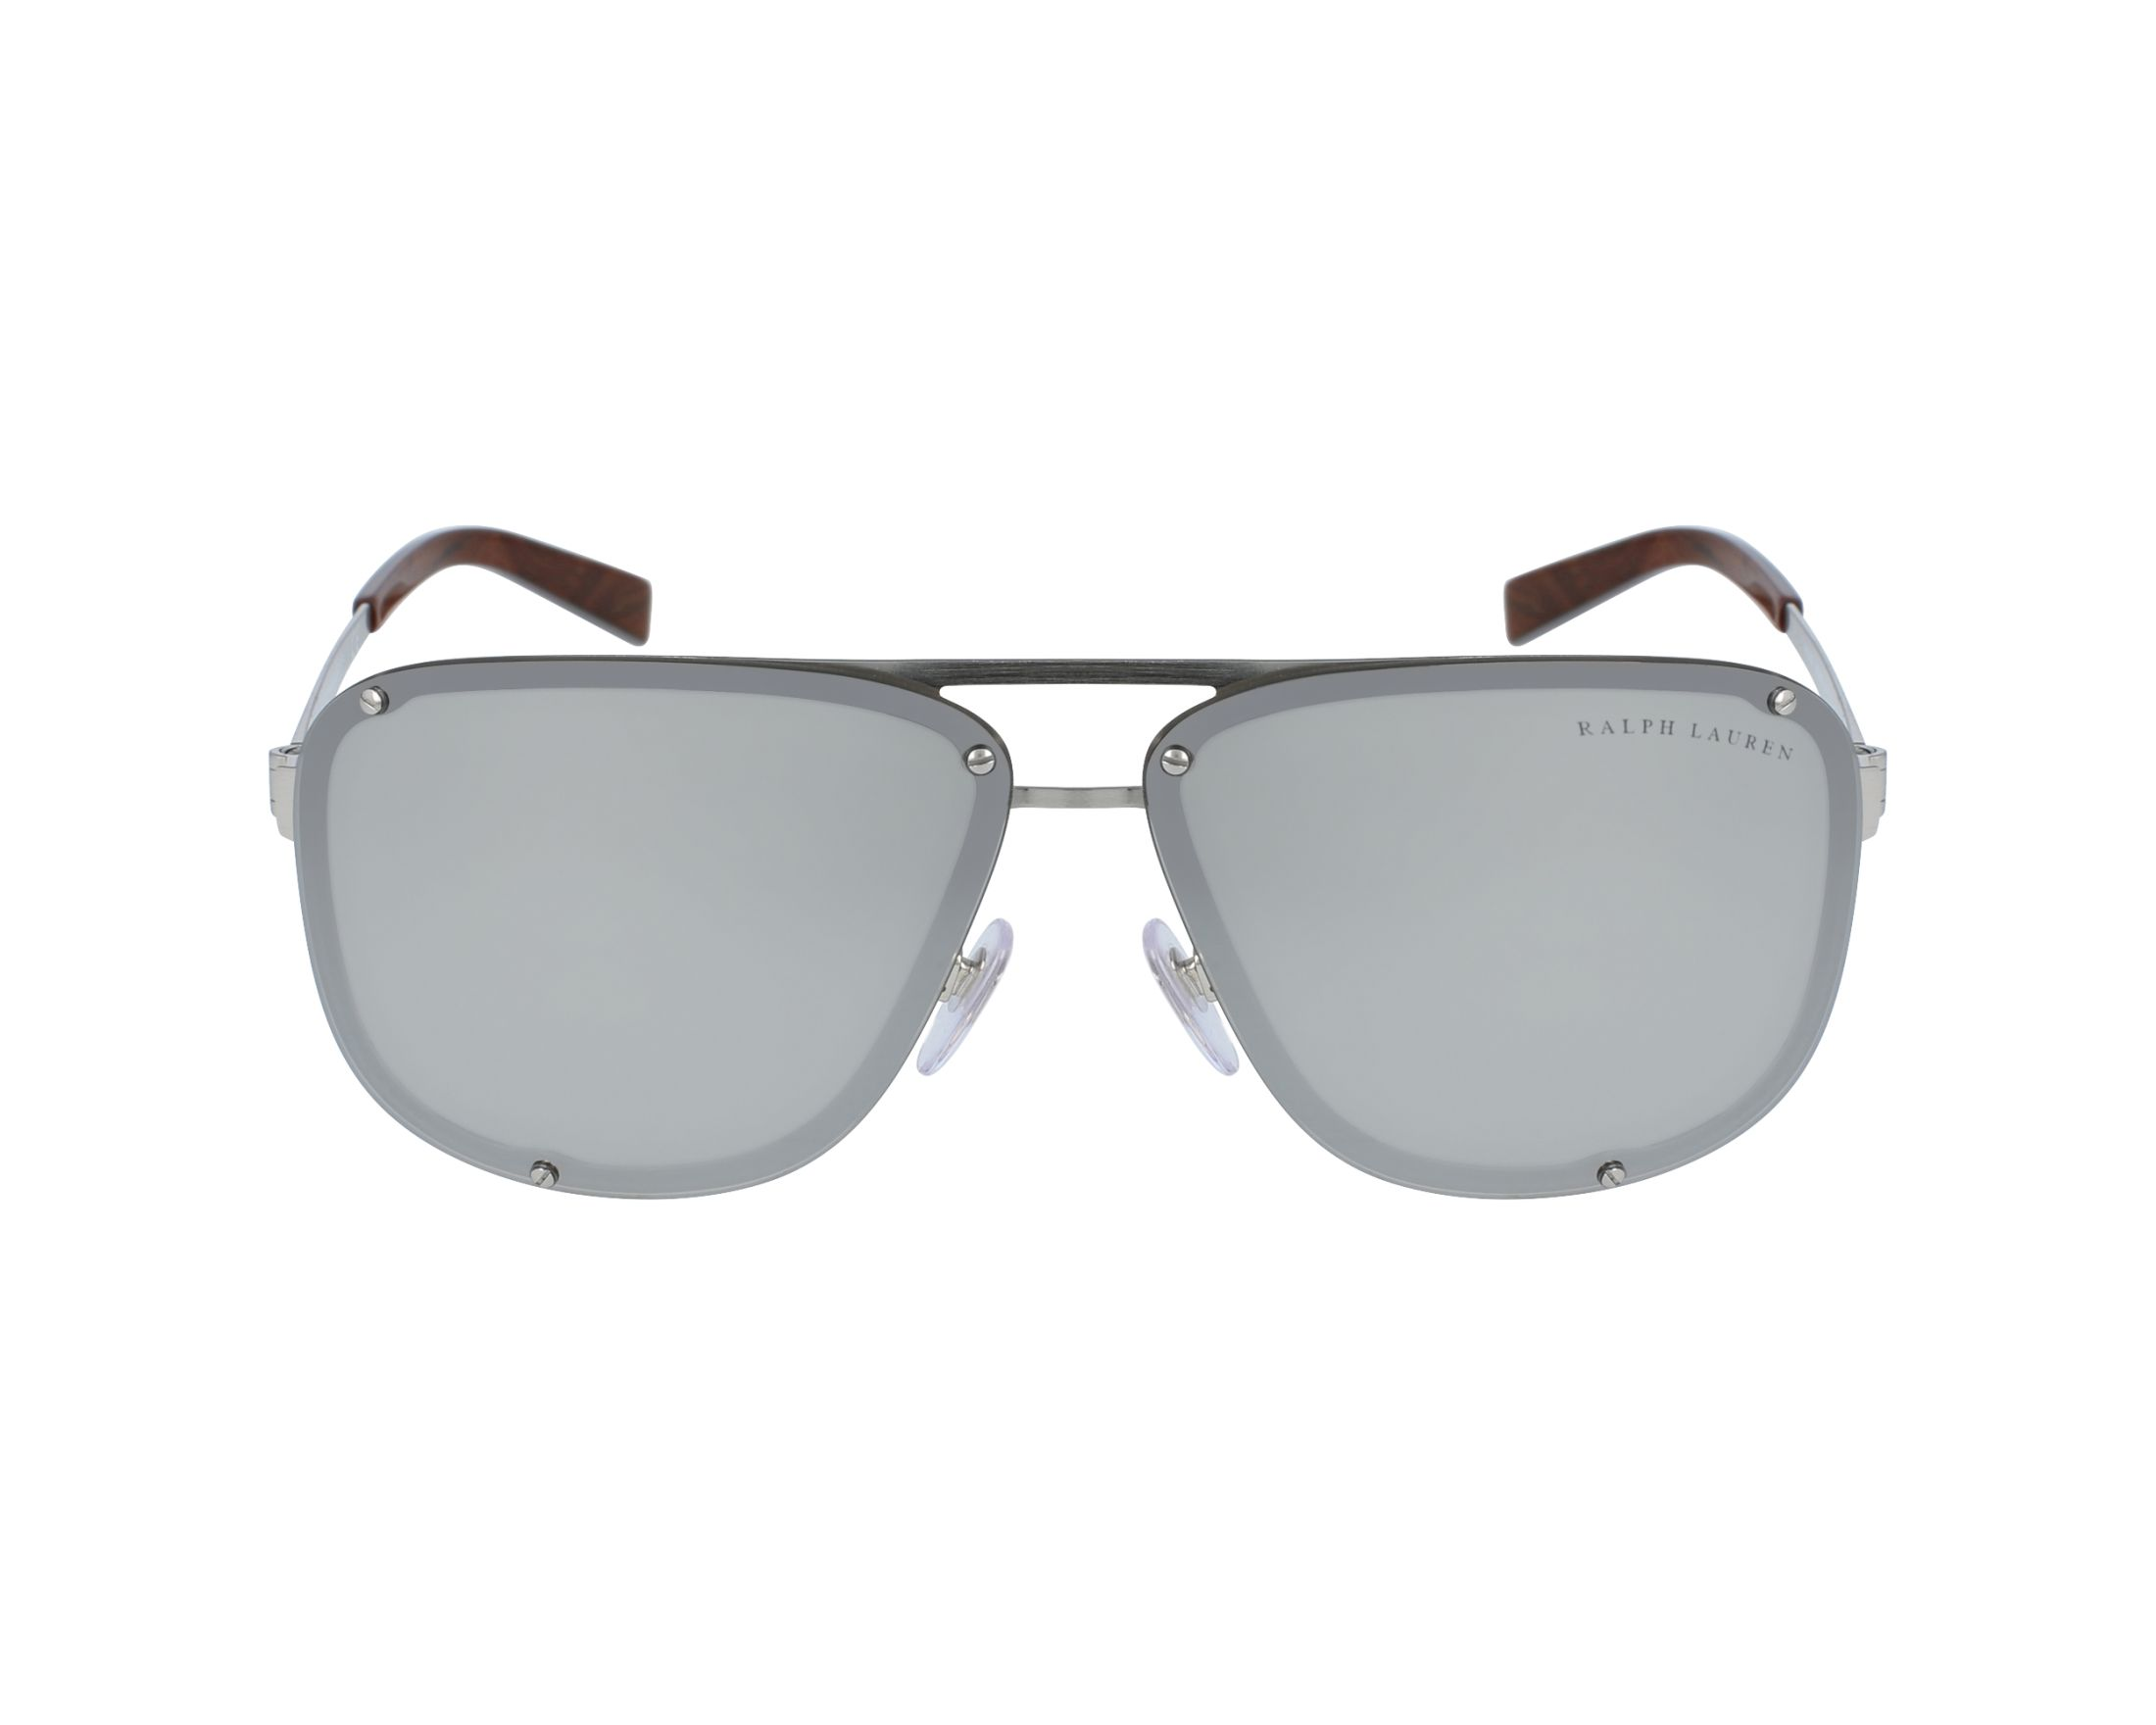 Sunglasses Ralph Lauren RL-7055 9030 6G 64-10 Silver profile view b50f6521a220